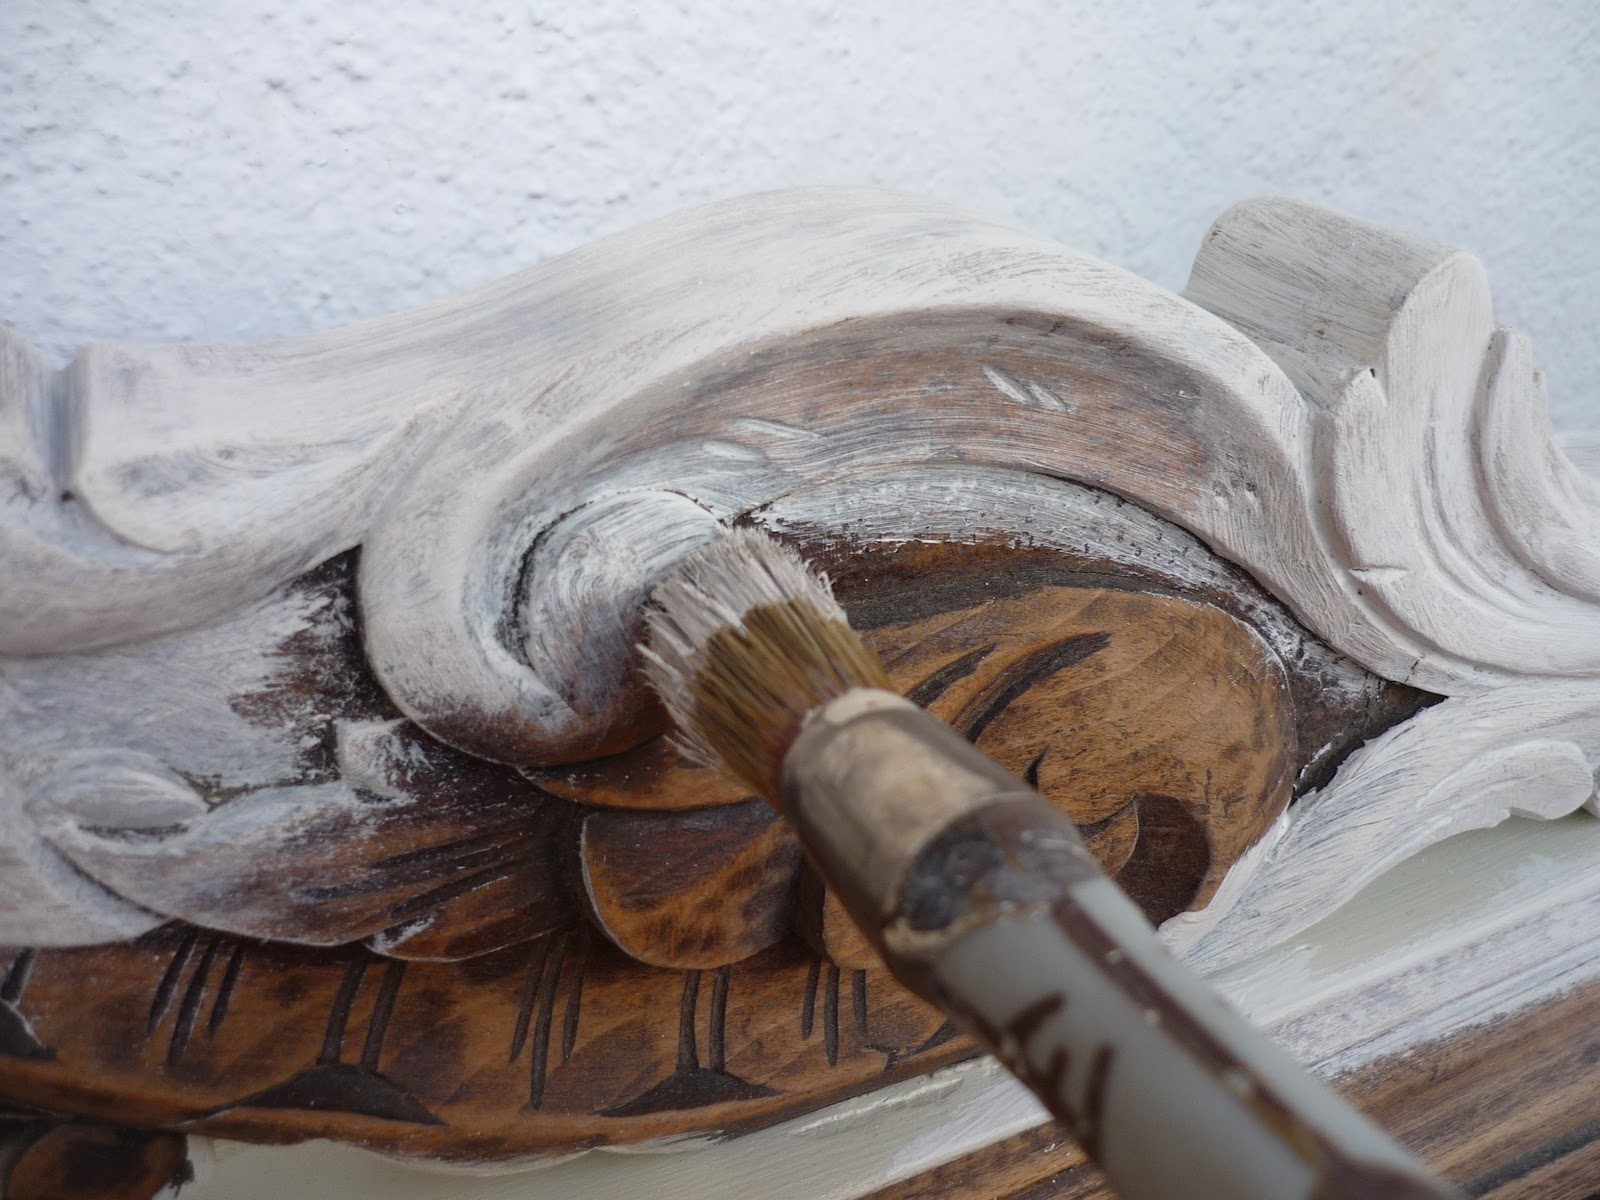 Restauracion y decoracion de madera pintar madera tallada - Pintura blanca para madera ...